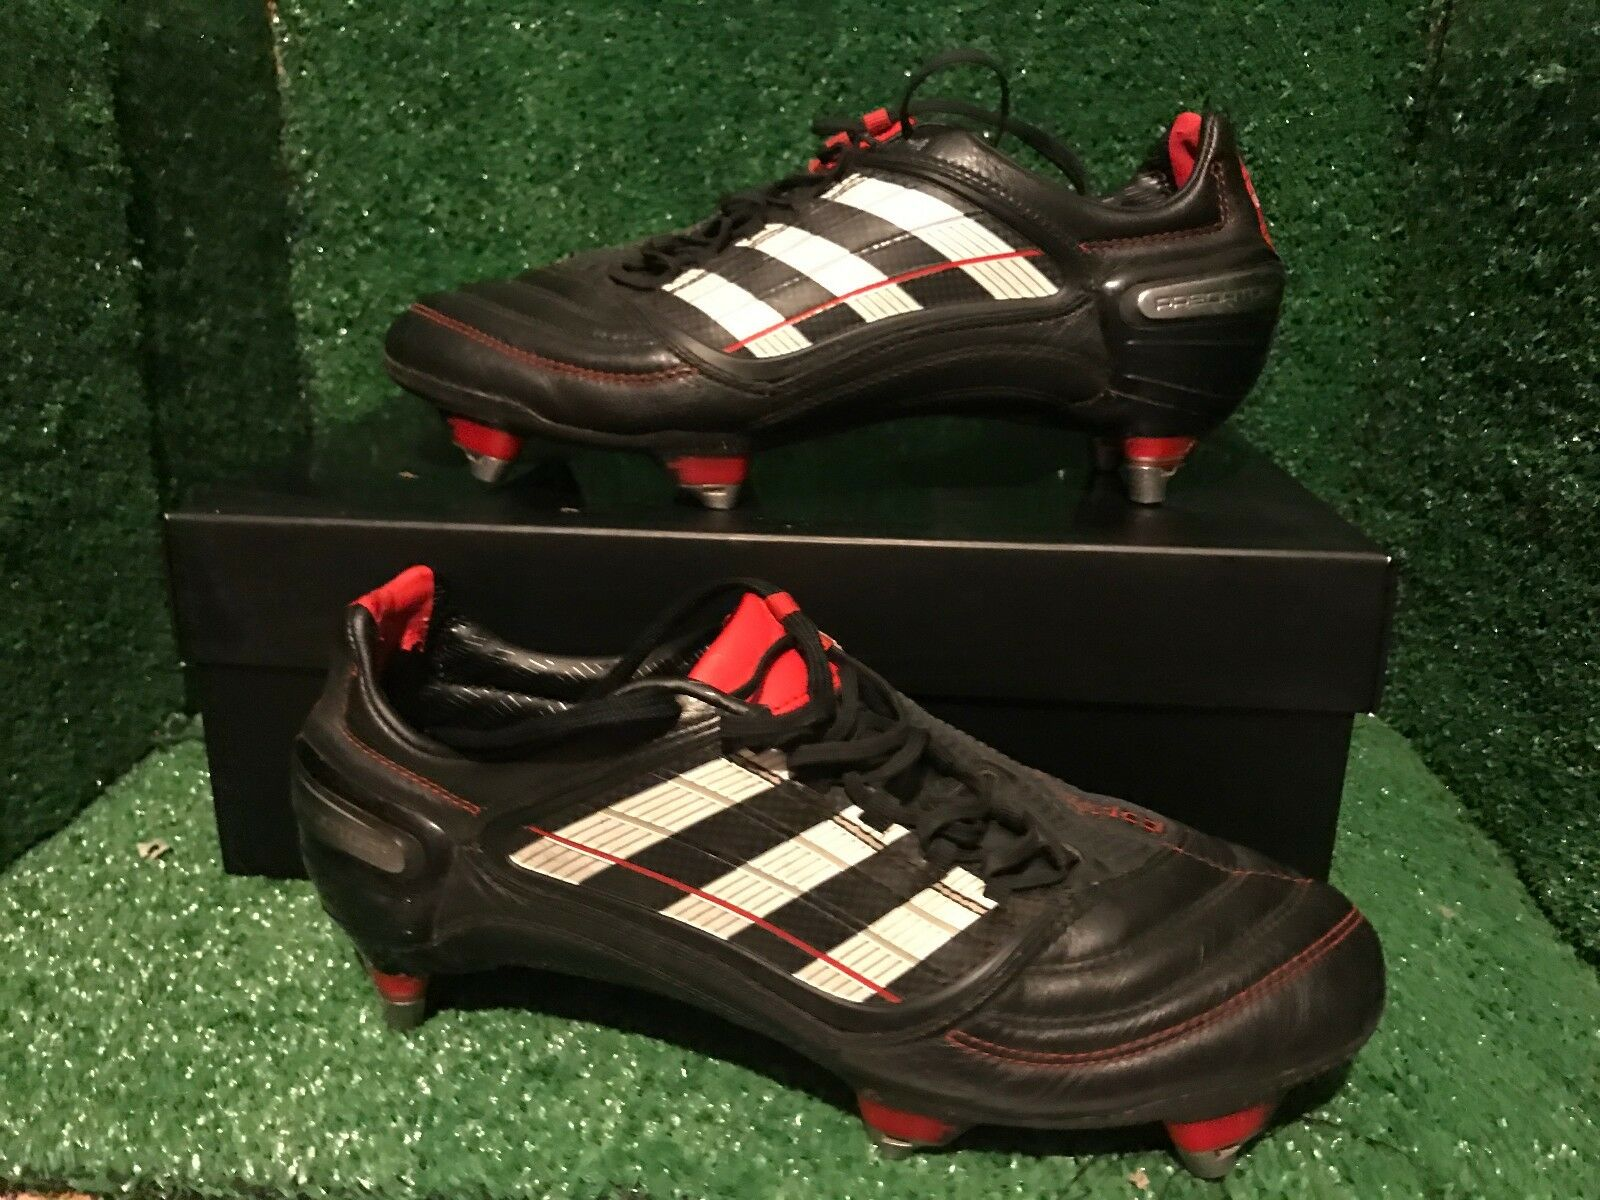 Adidas Prossoator pulse Powerswerve Football scarpe Dimensione 8,5 8 42